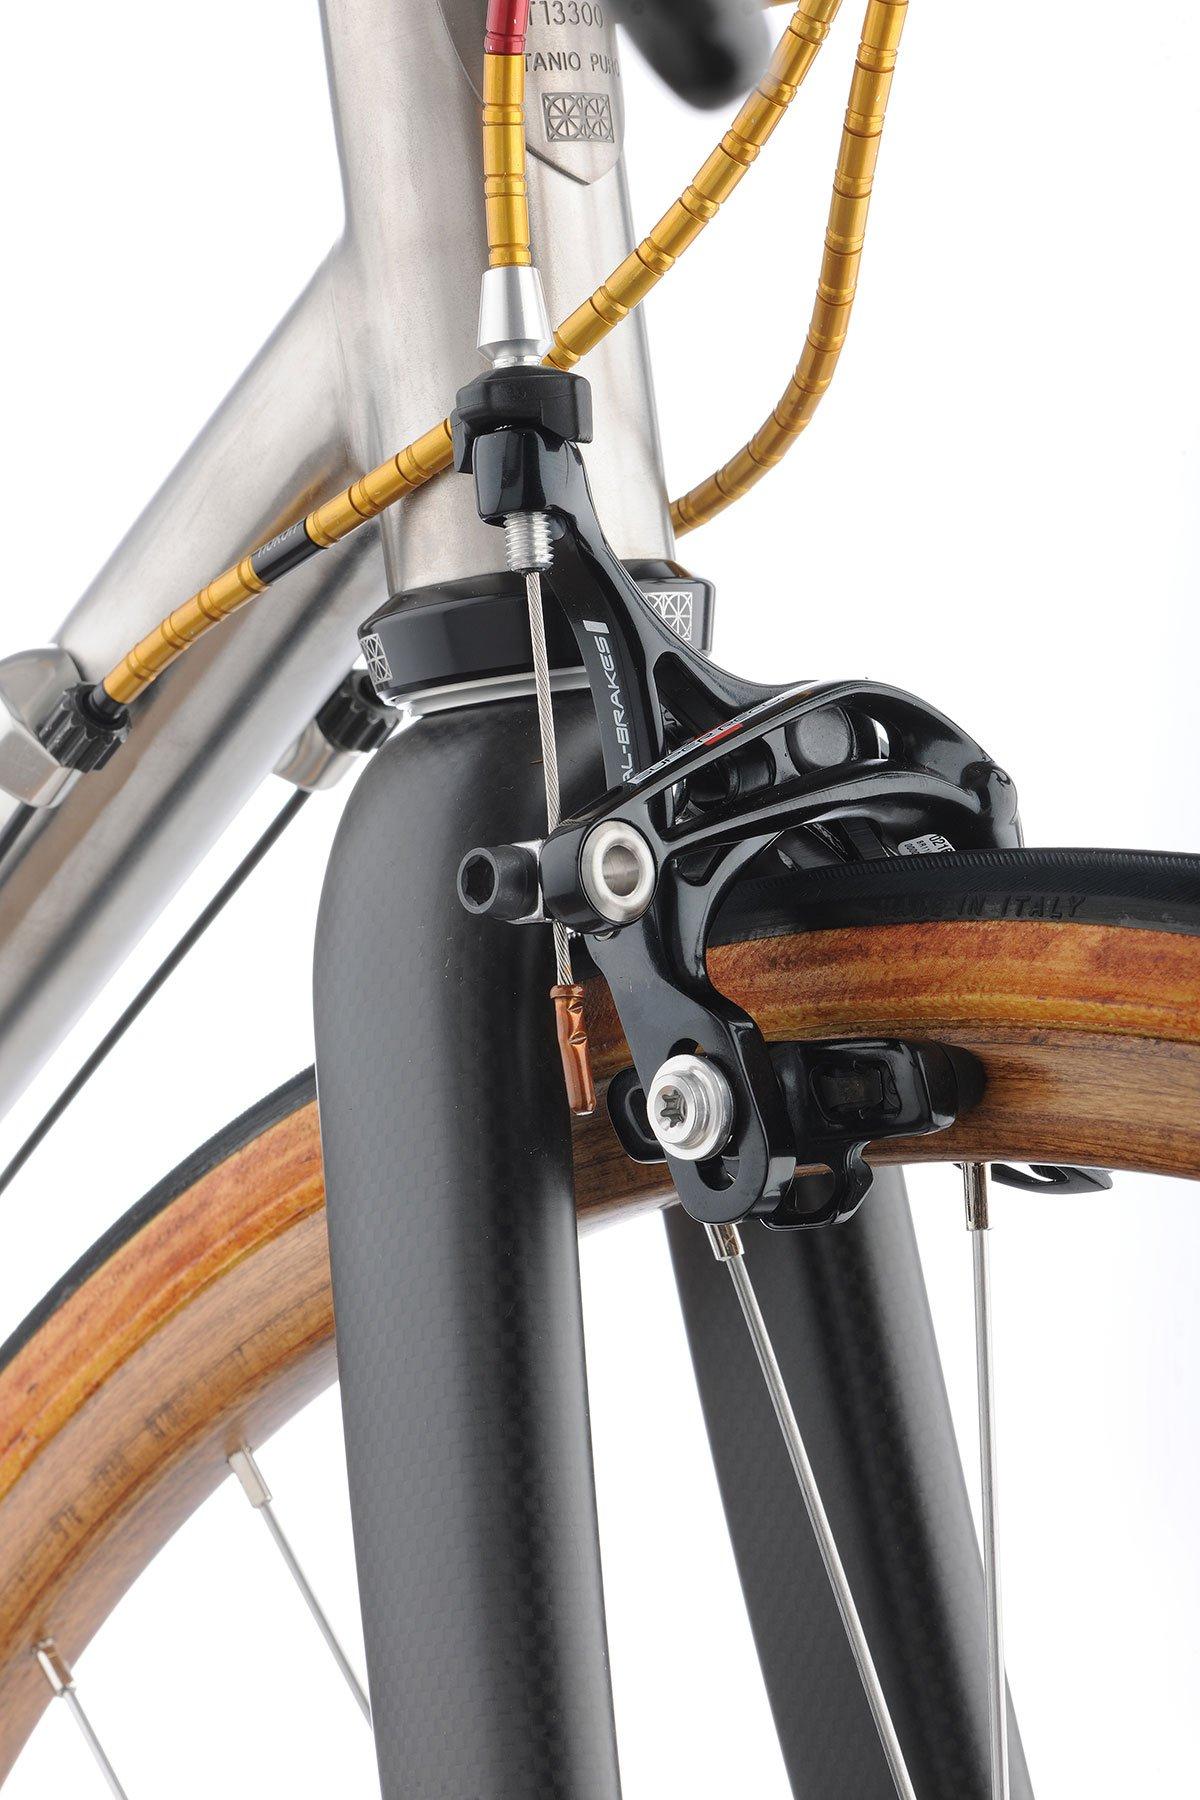 passoni-world-best-titanium-bicycles-italy-7